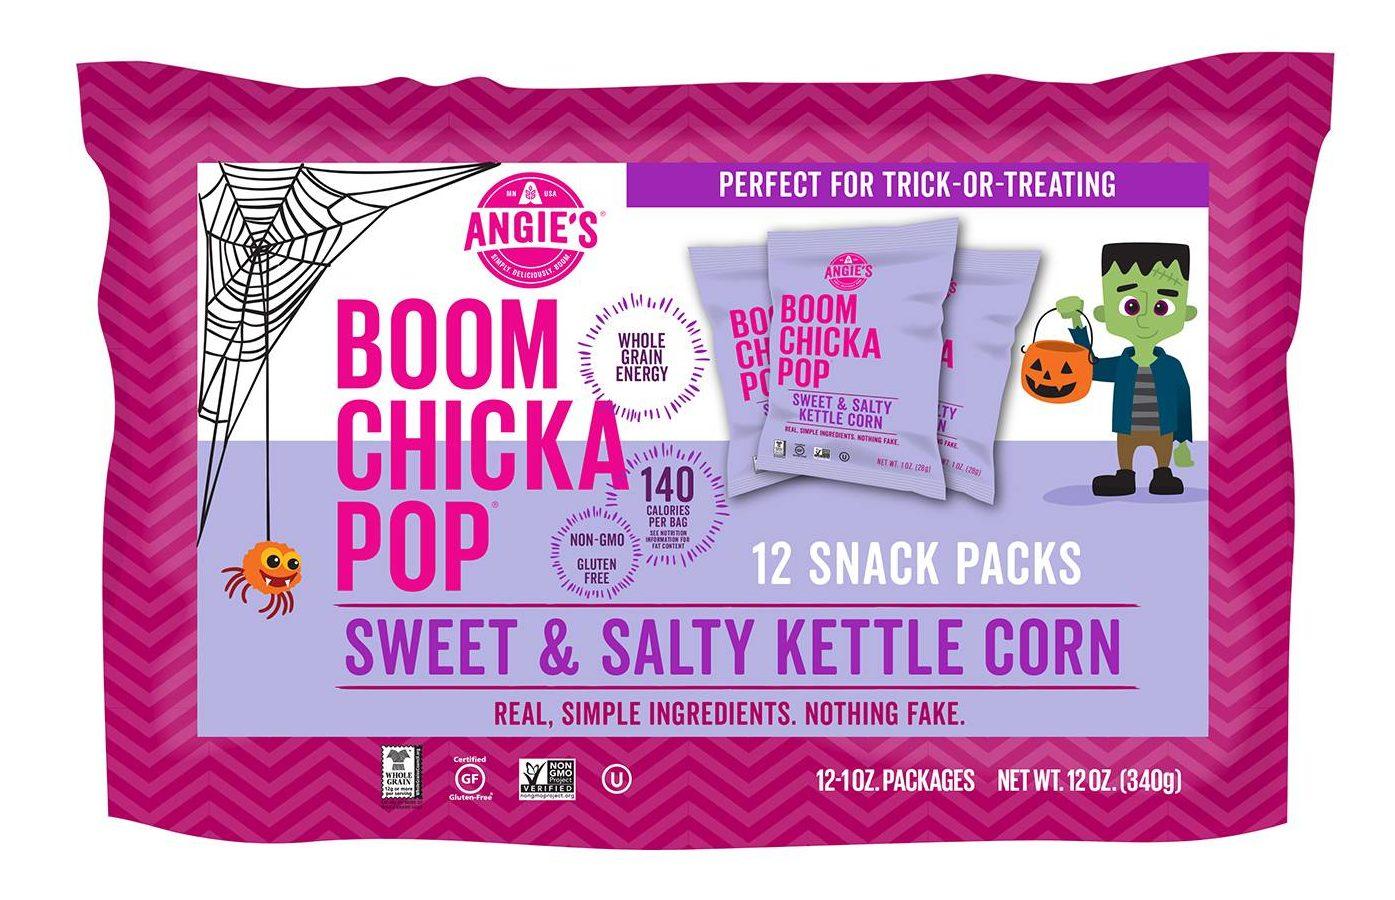 Boomchickapop Kettle Corn | smelltheroses.com